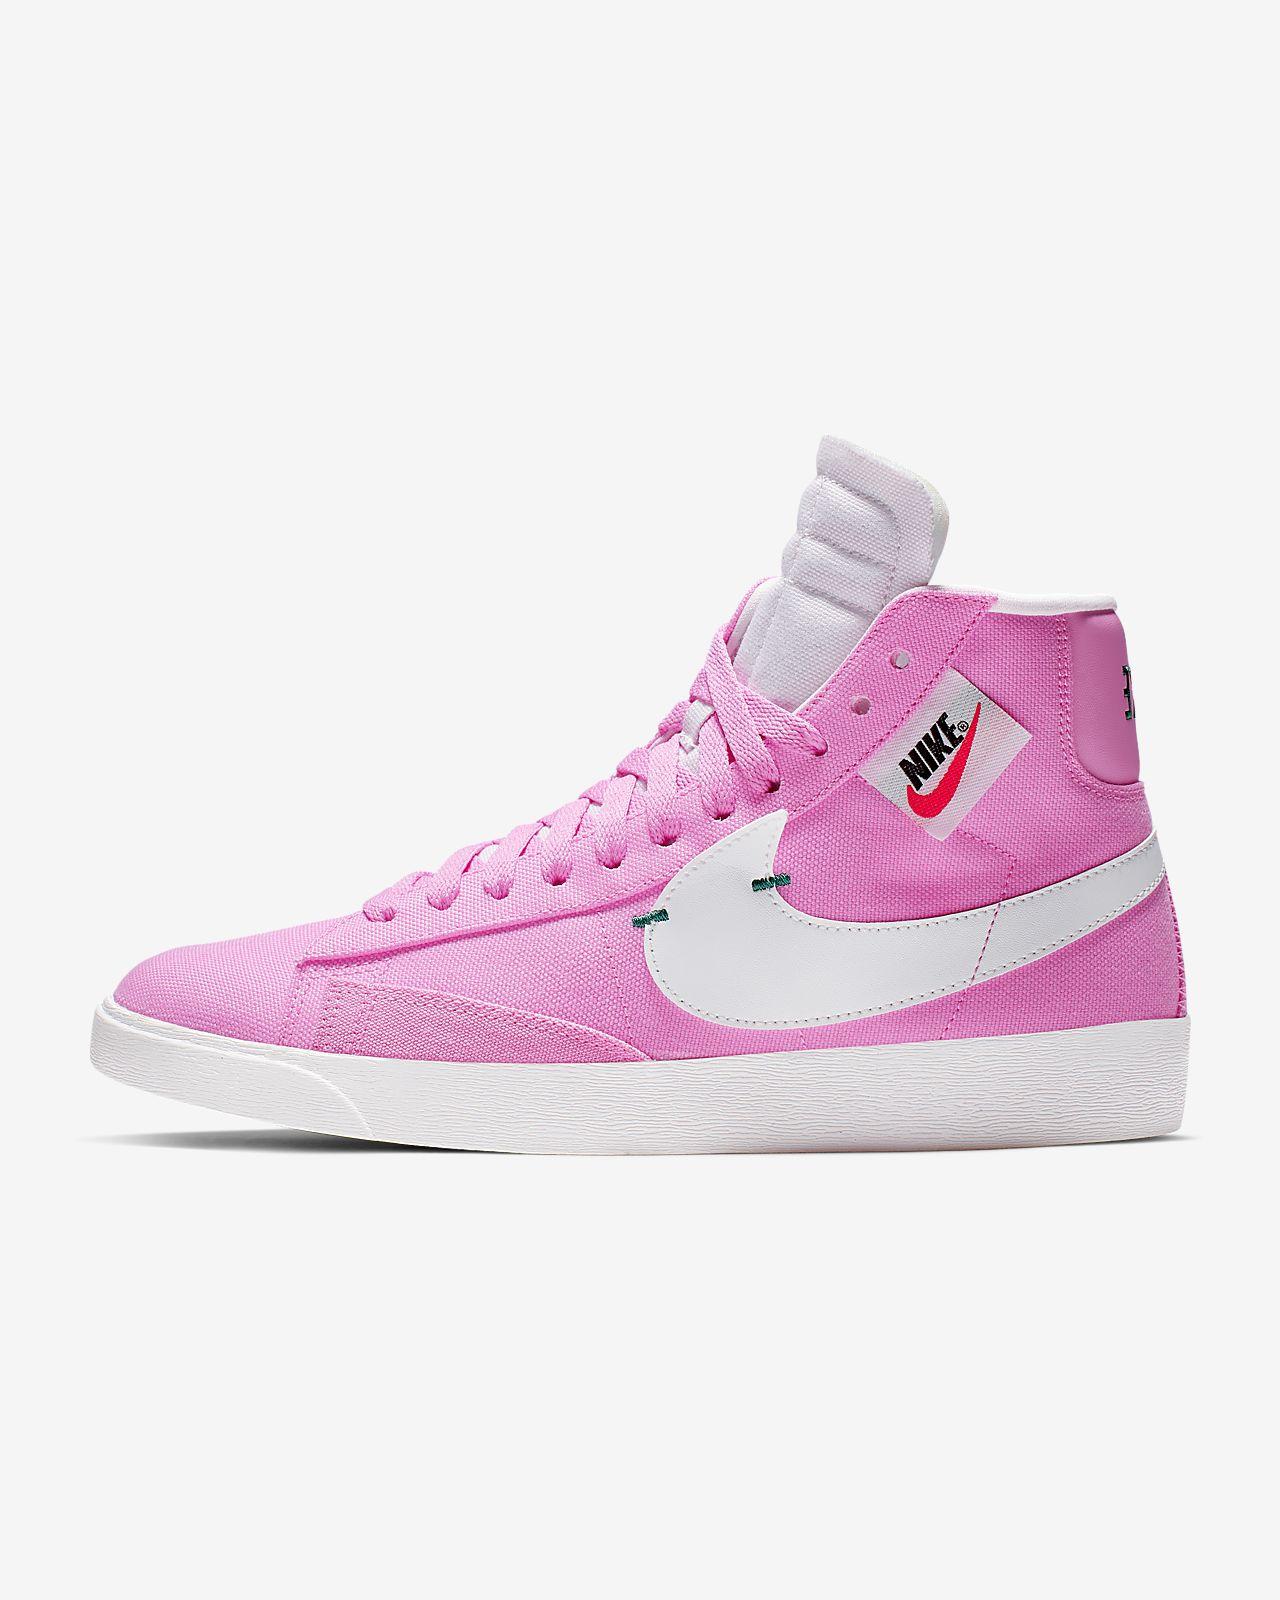 cef075f118f3 Nike Blazer Mid Rebel Women s Shoe. Nike.com GB